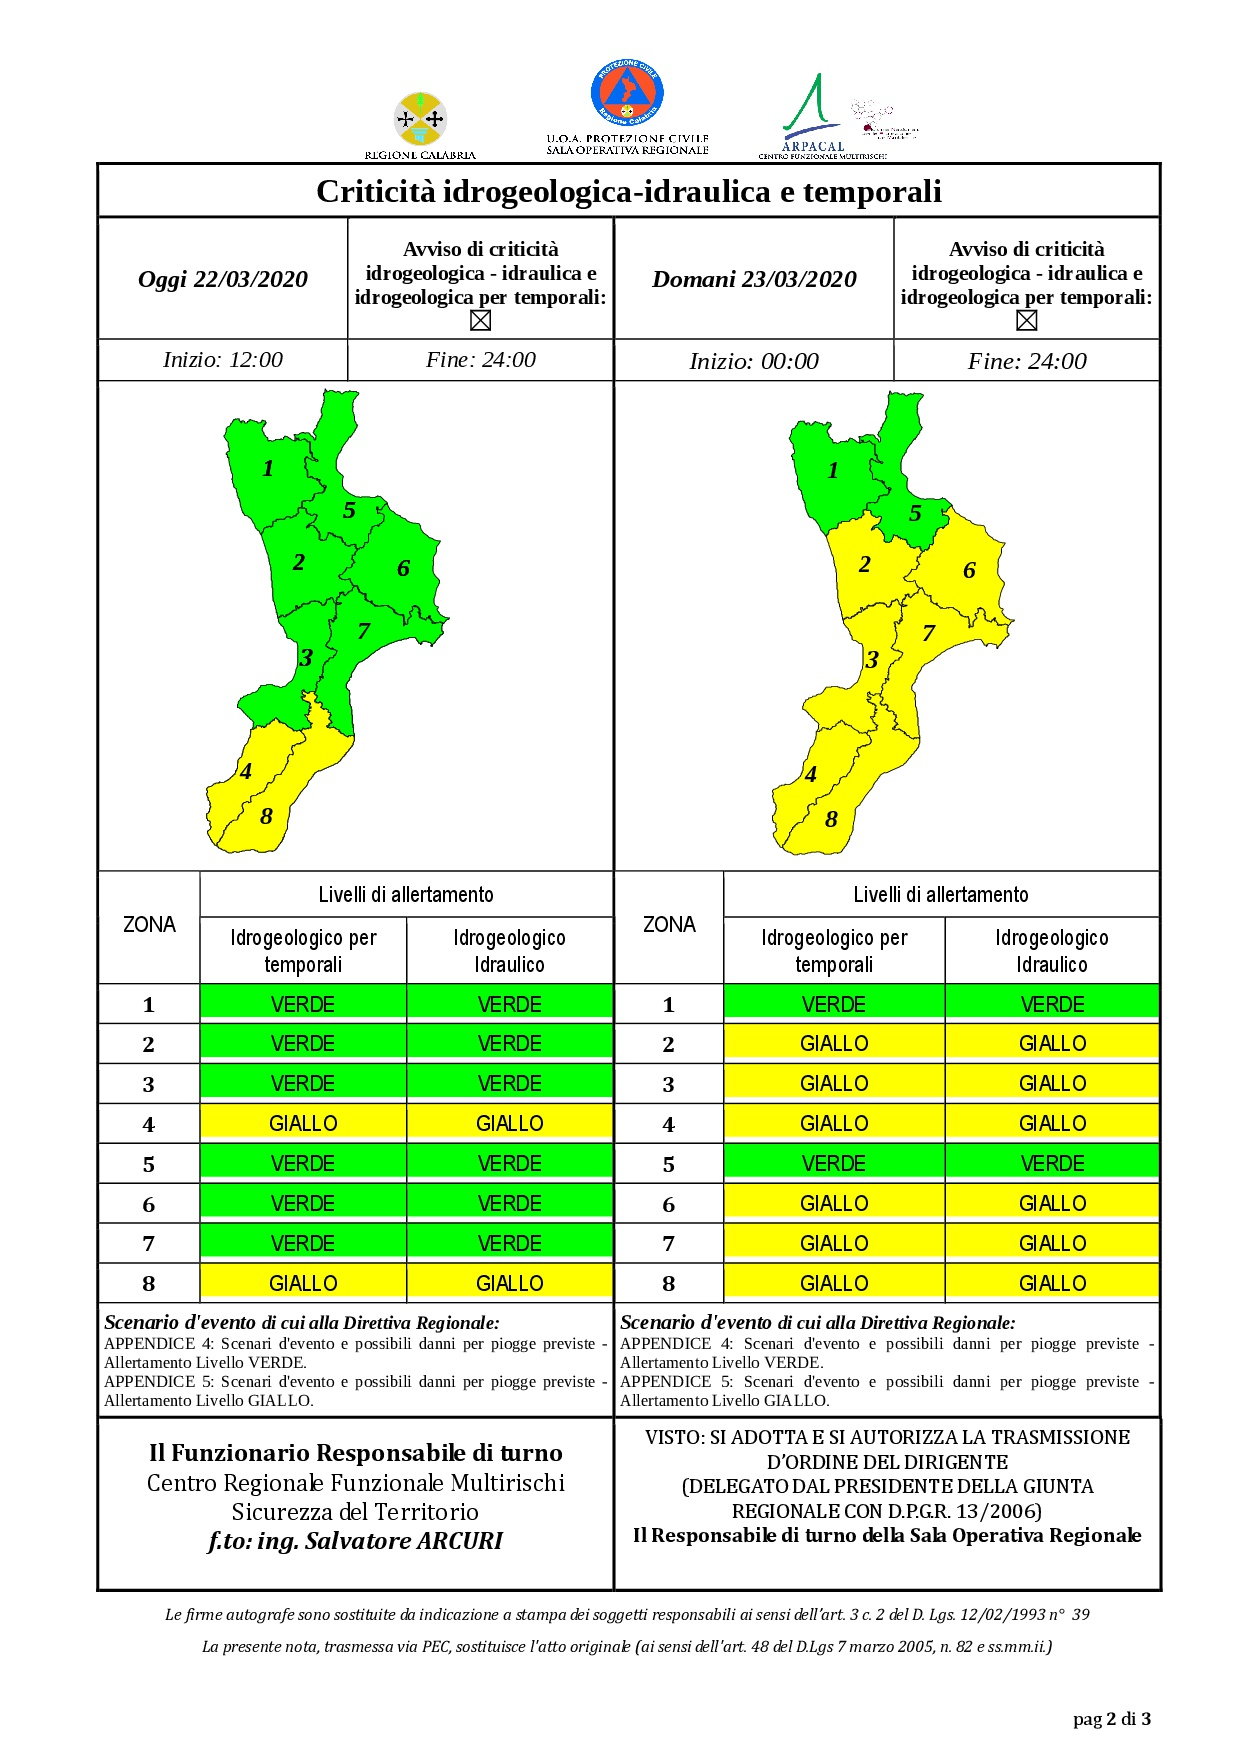 Criticità idrogeologica-idraulica e temporali in Calabria 22-03-2020